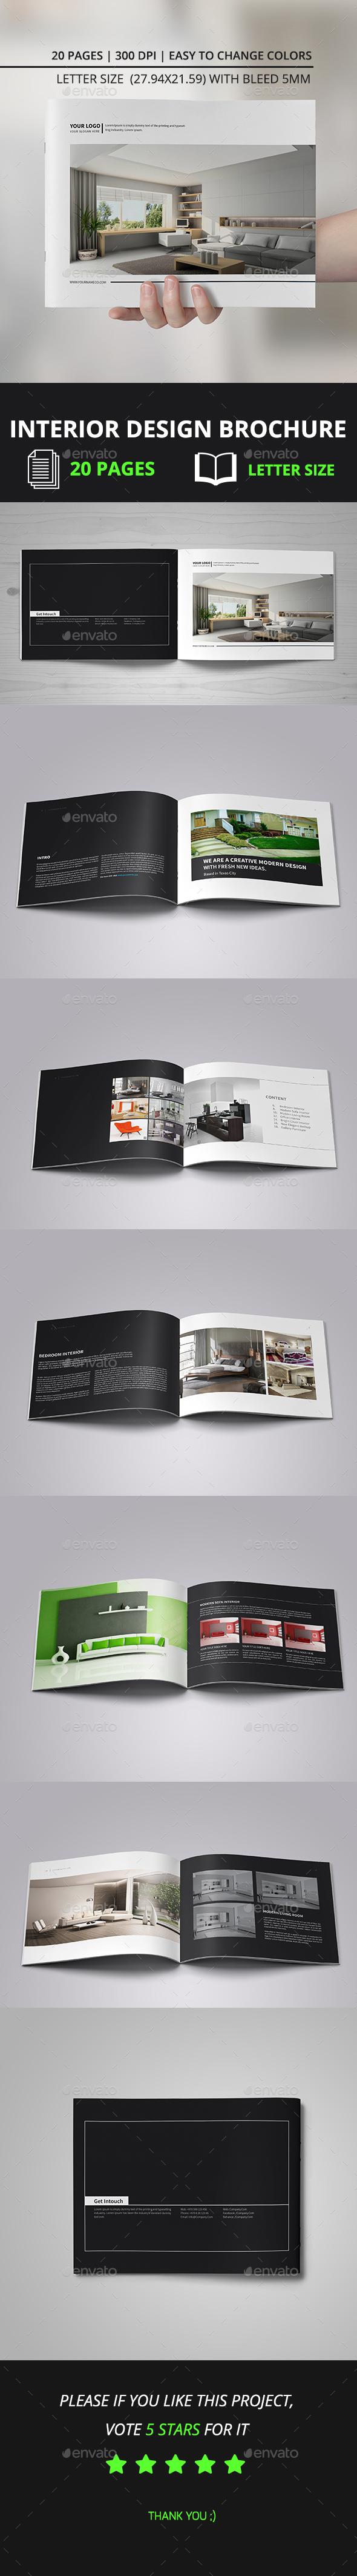 Interior Design Brochure 2016 - Catalogs Brochures